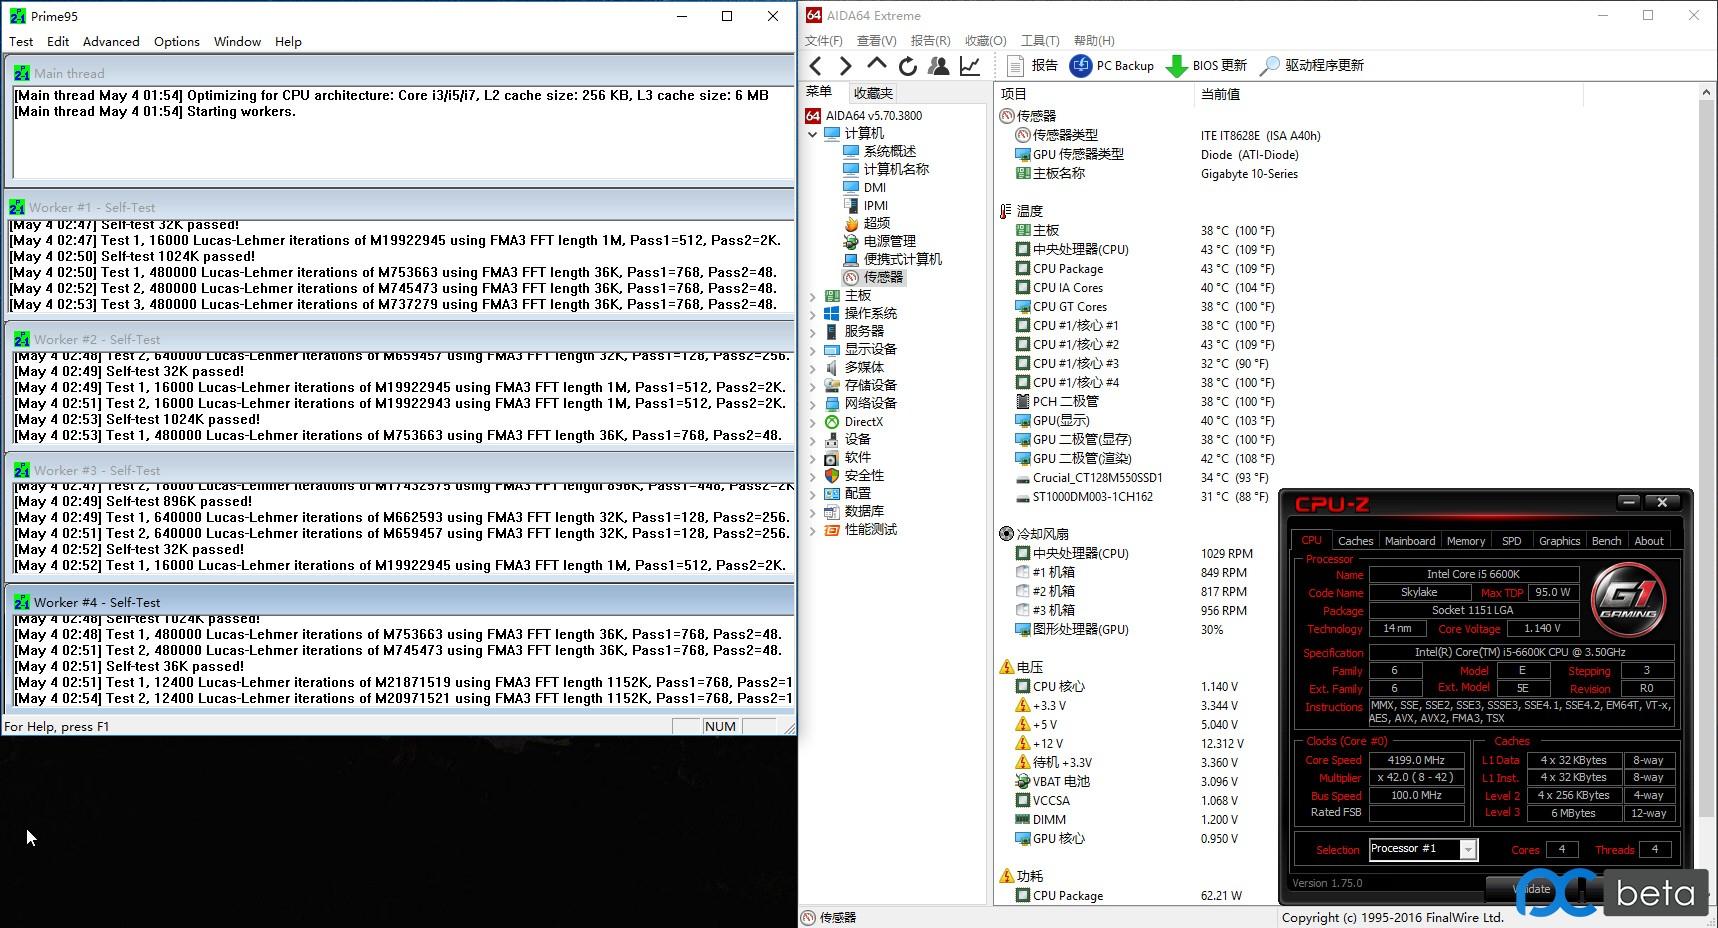 1.15V 4.2G prime95.jpg